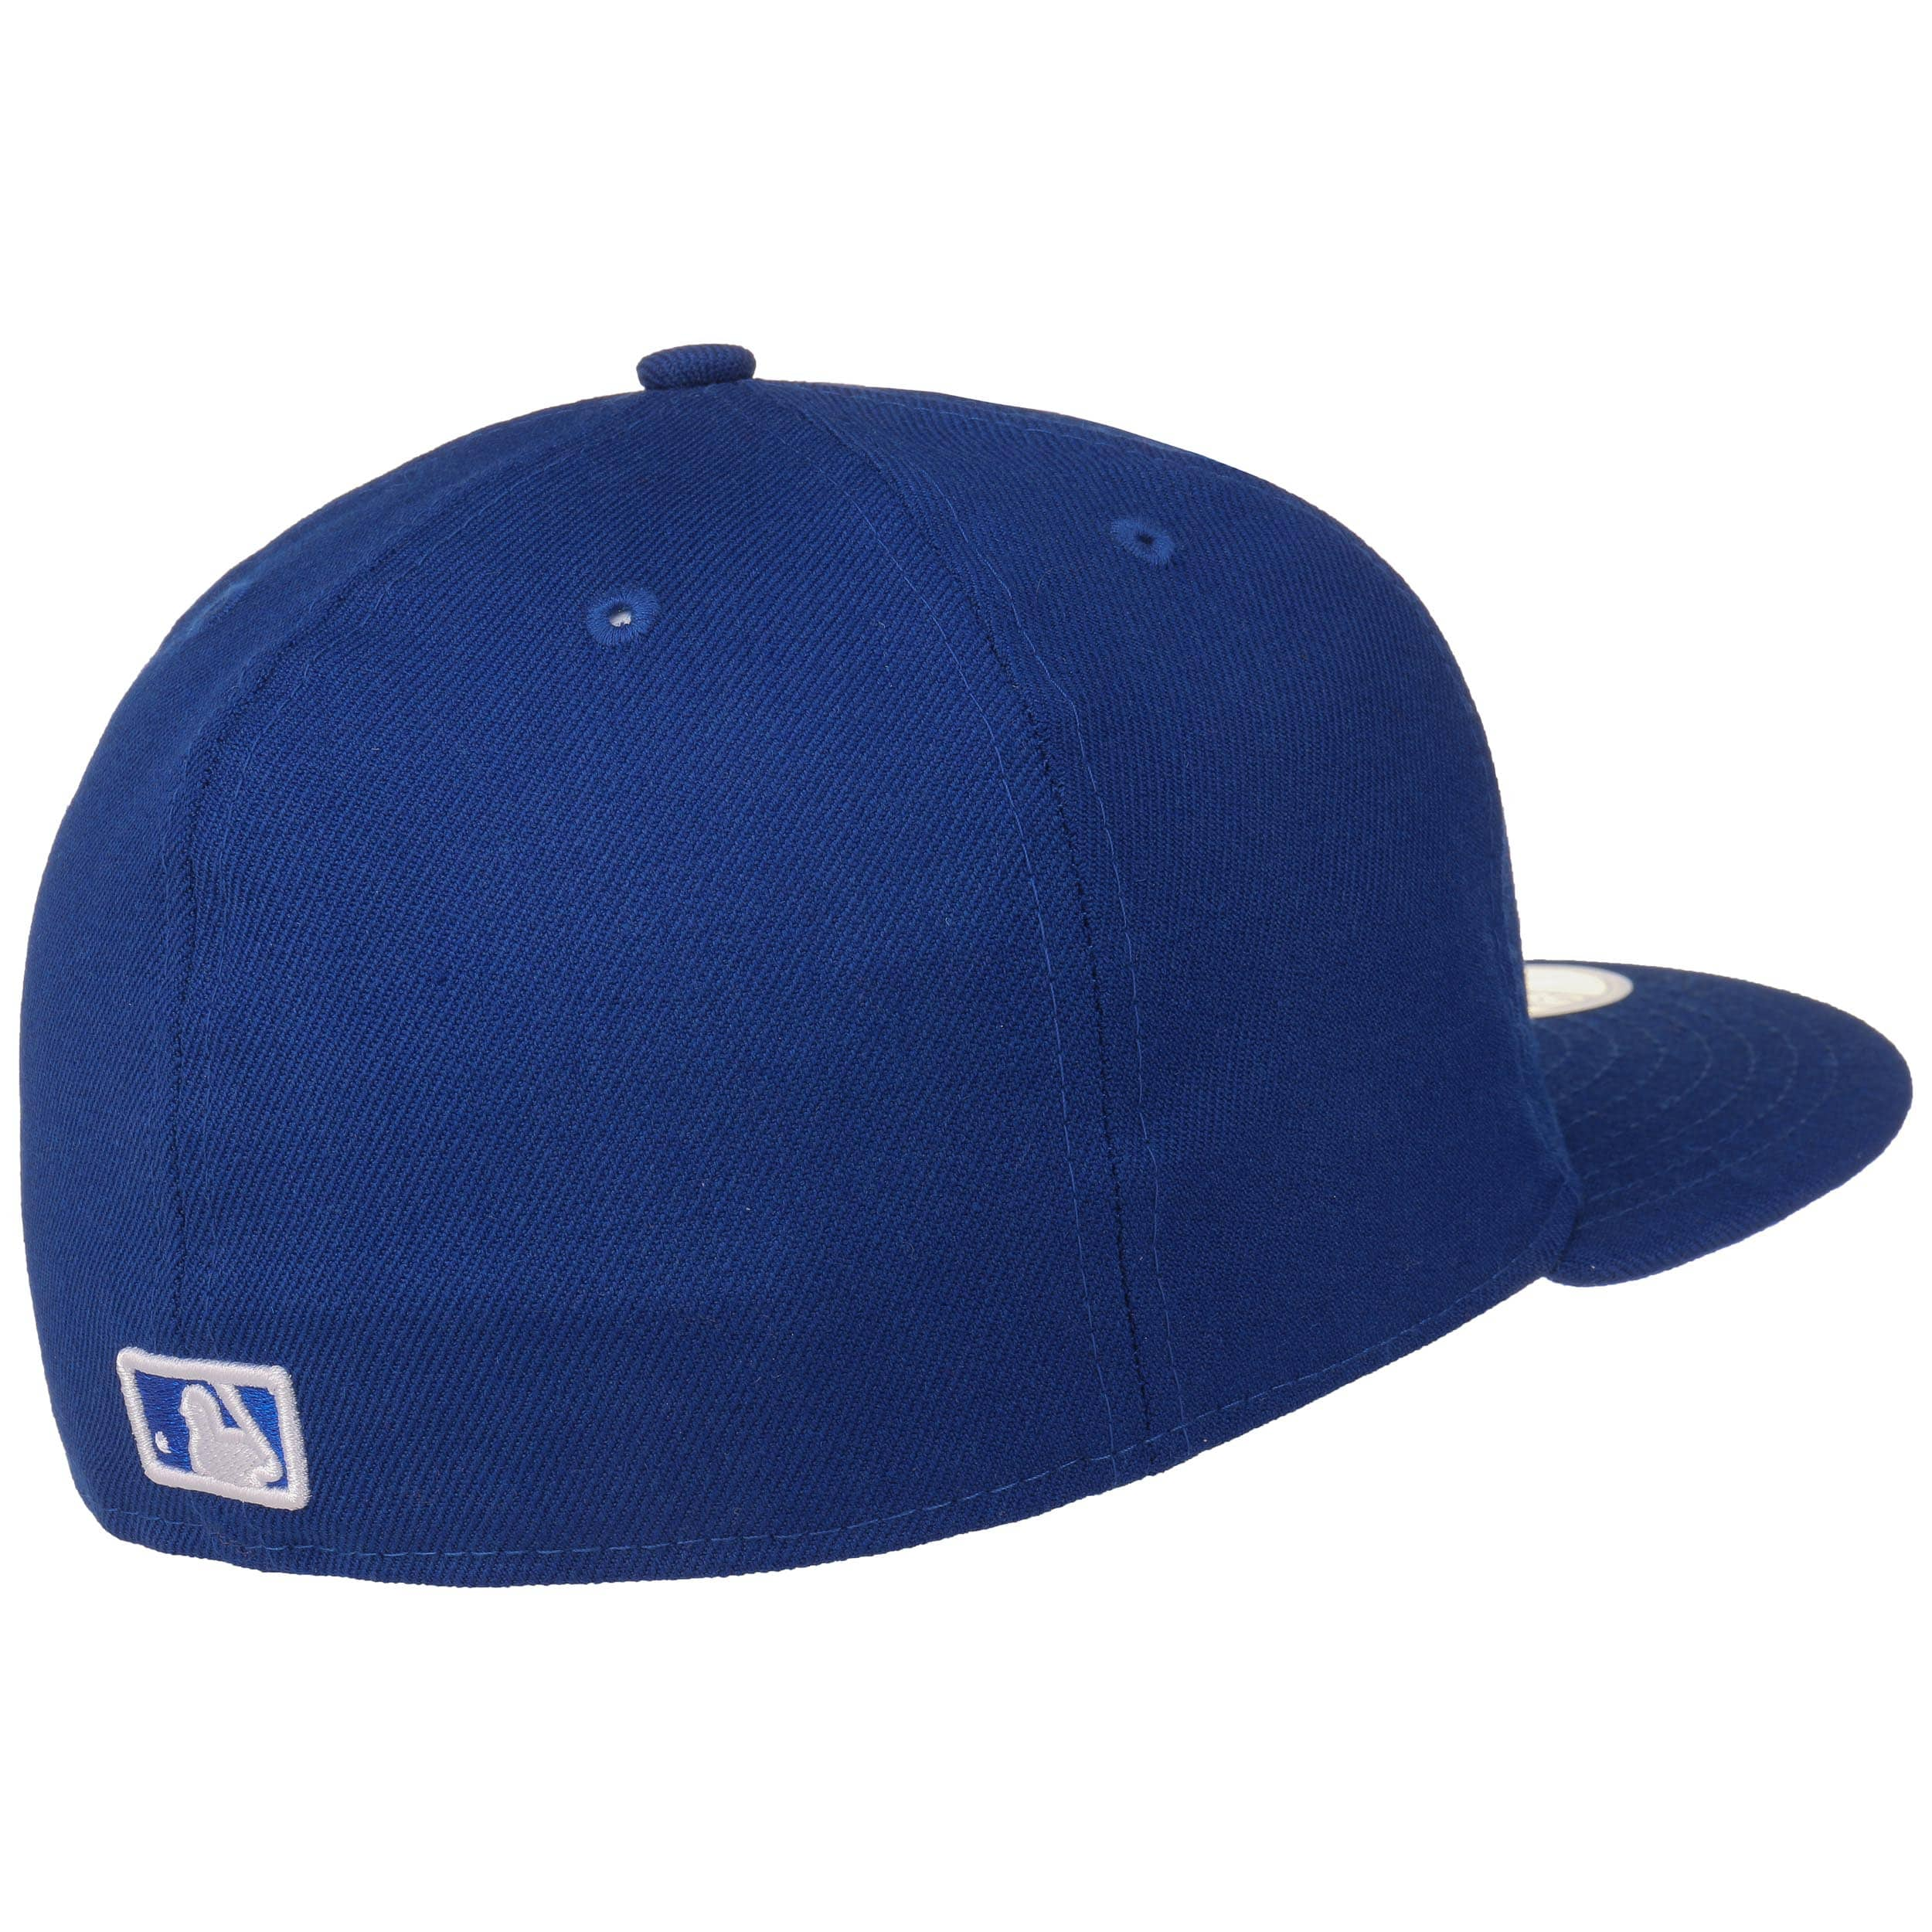 c1cf5021b09b4 ... 59Fifty MLB Basic NY Cap by New Era - blue 3 ...